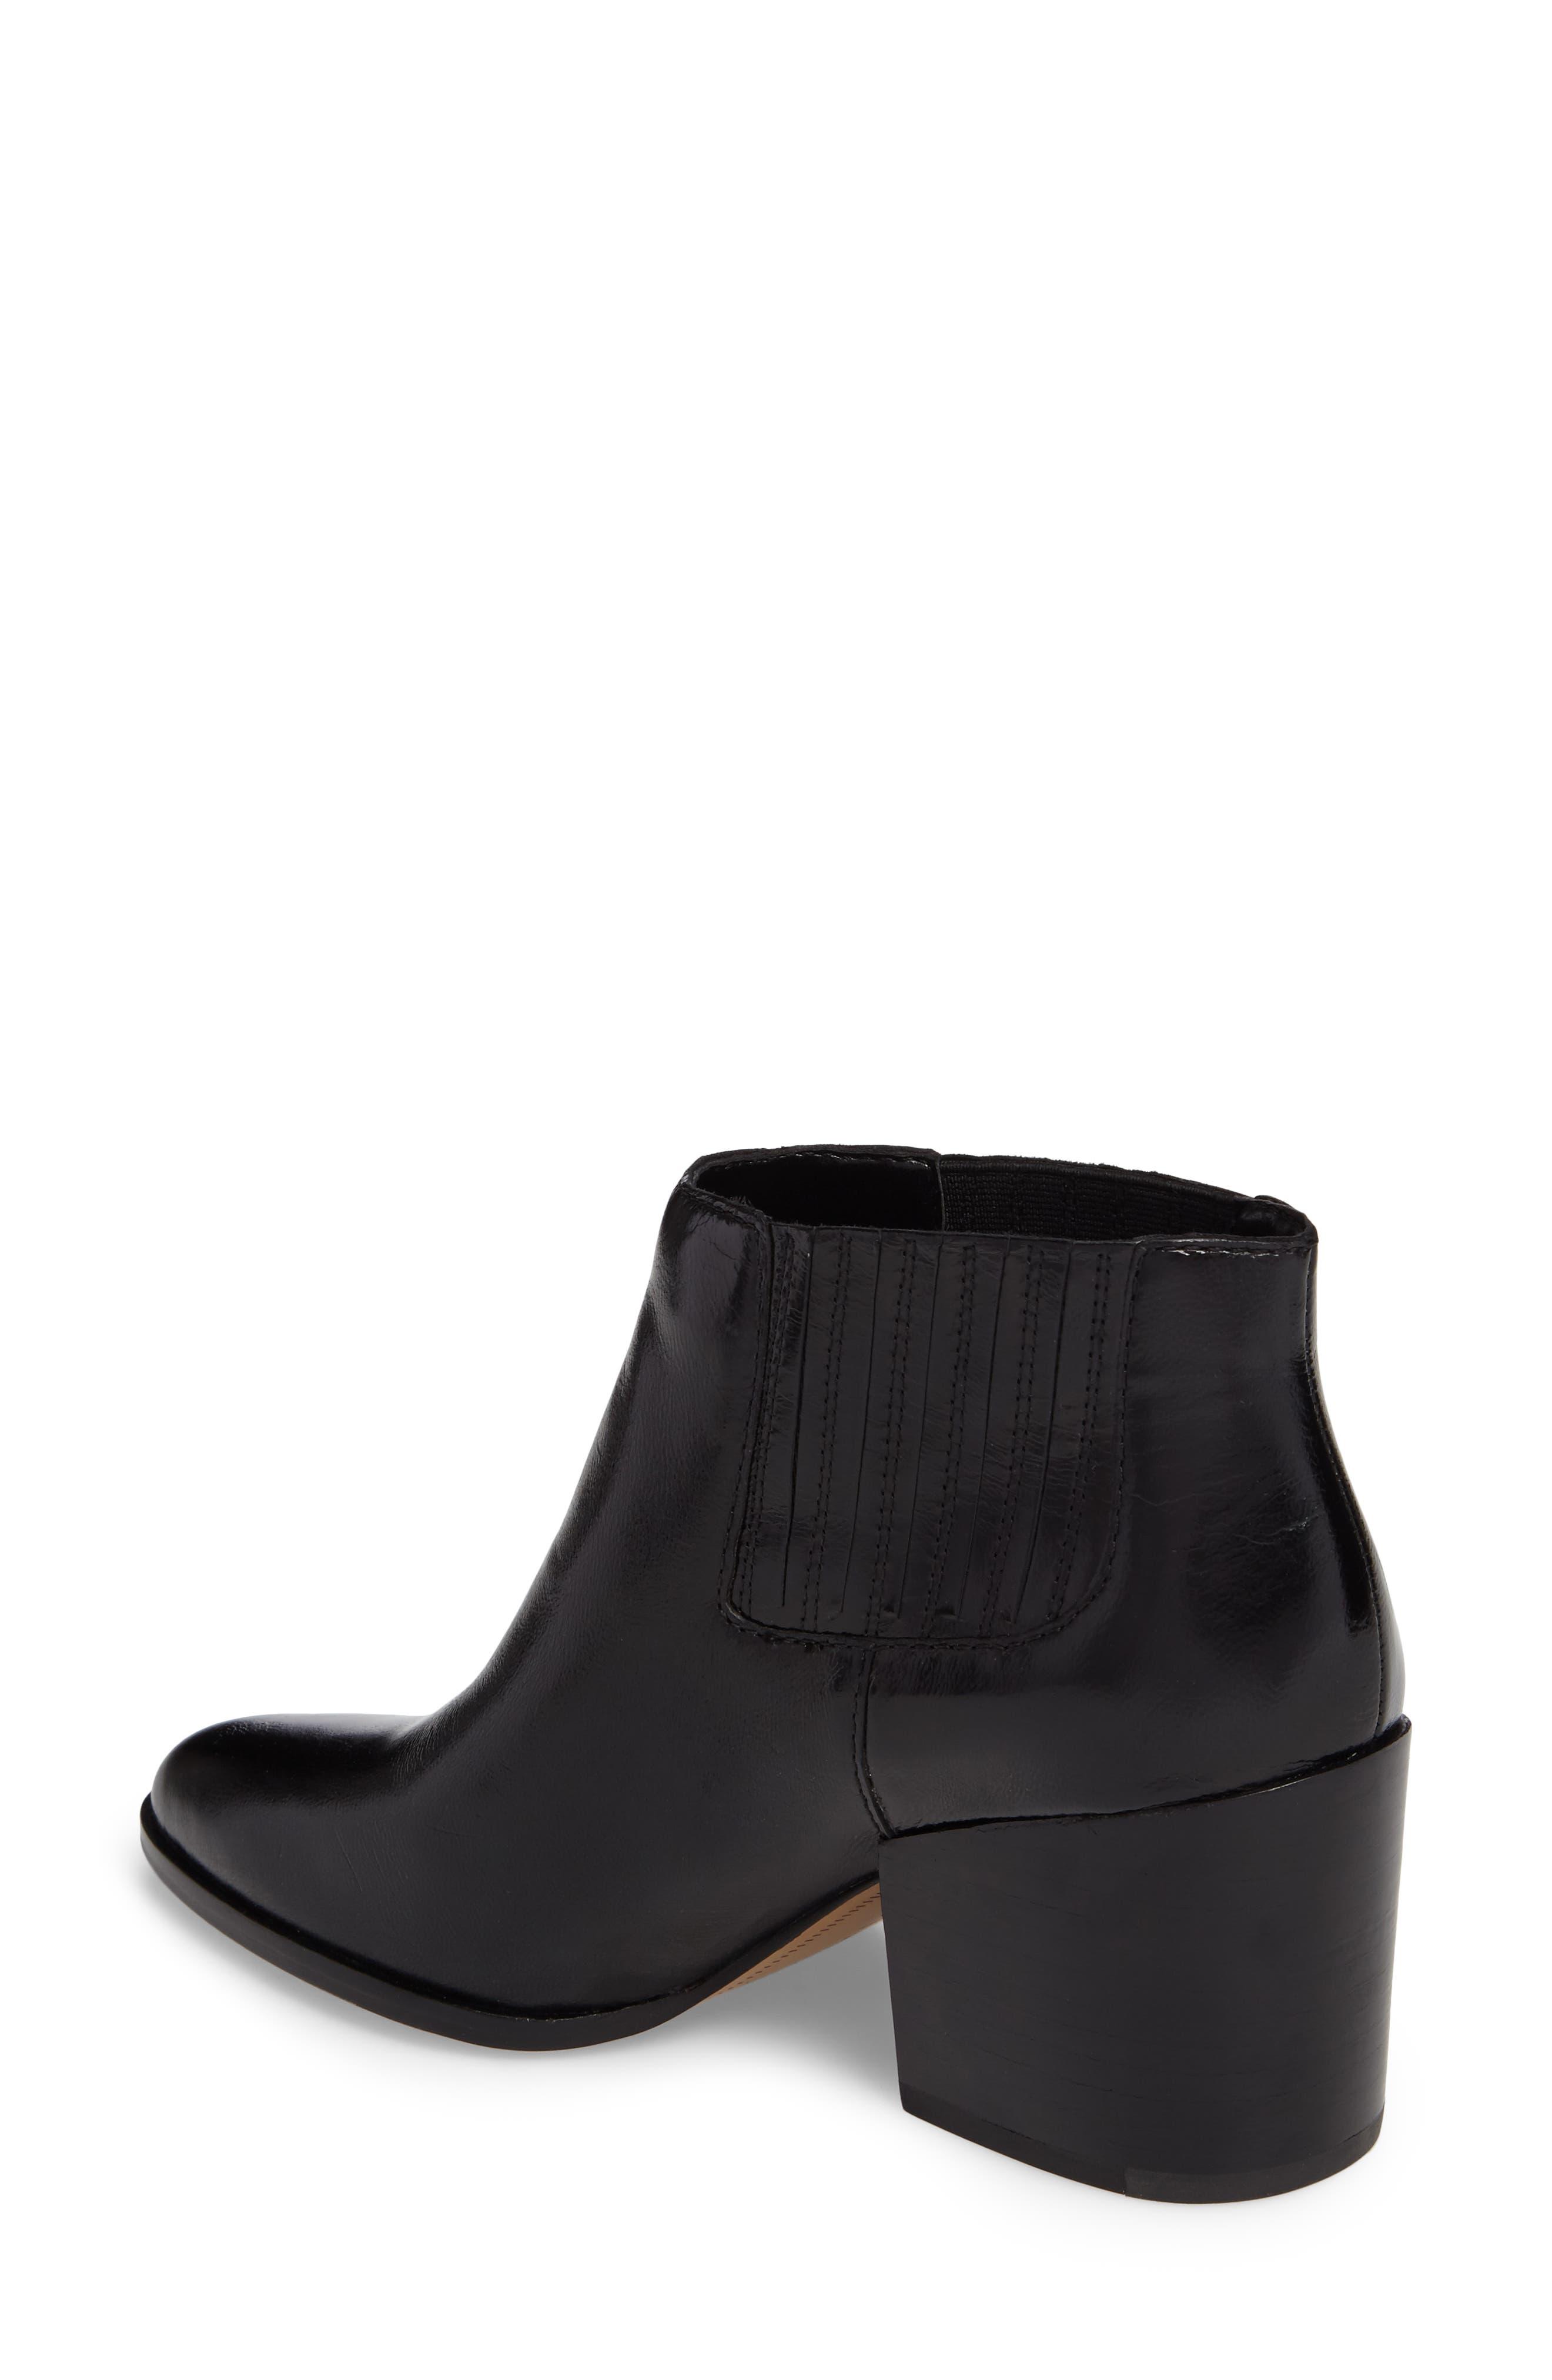 Jemore Boot,                             Alternate thumbnail 2, color,                             Black Leather